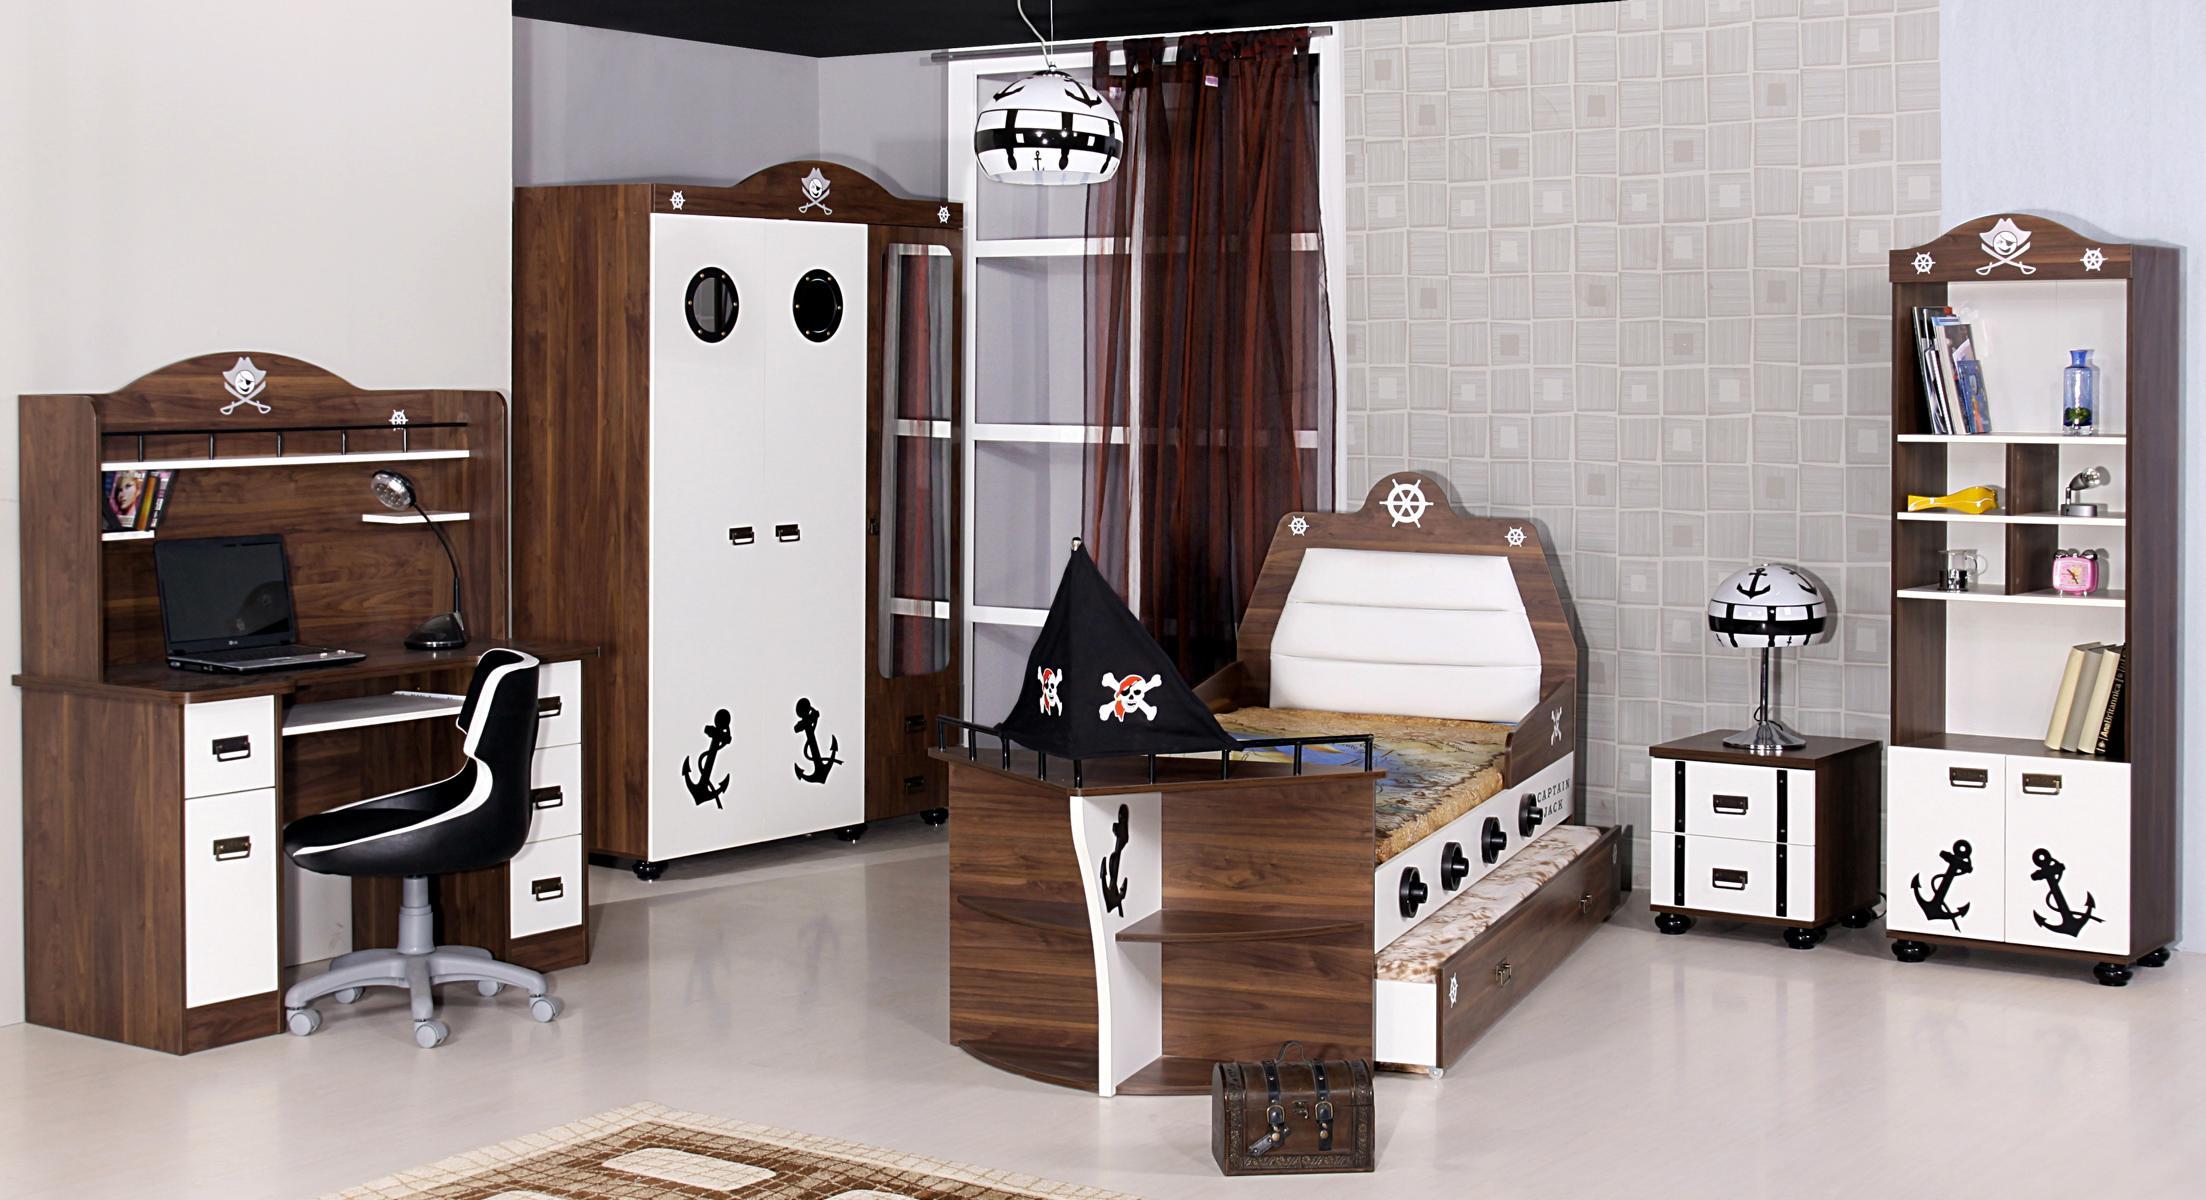 piratenbett kinderzimmer pirat. Black Bedroom Furniture Sets. Home Design Ideas